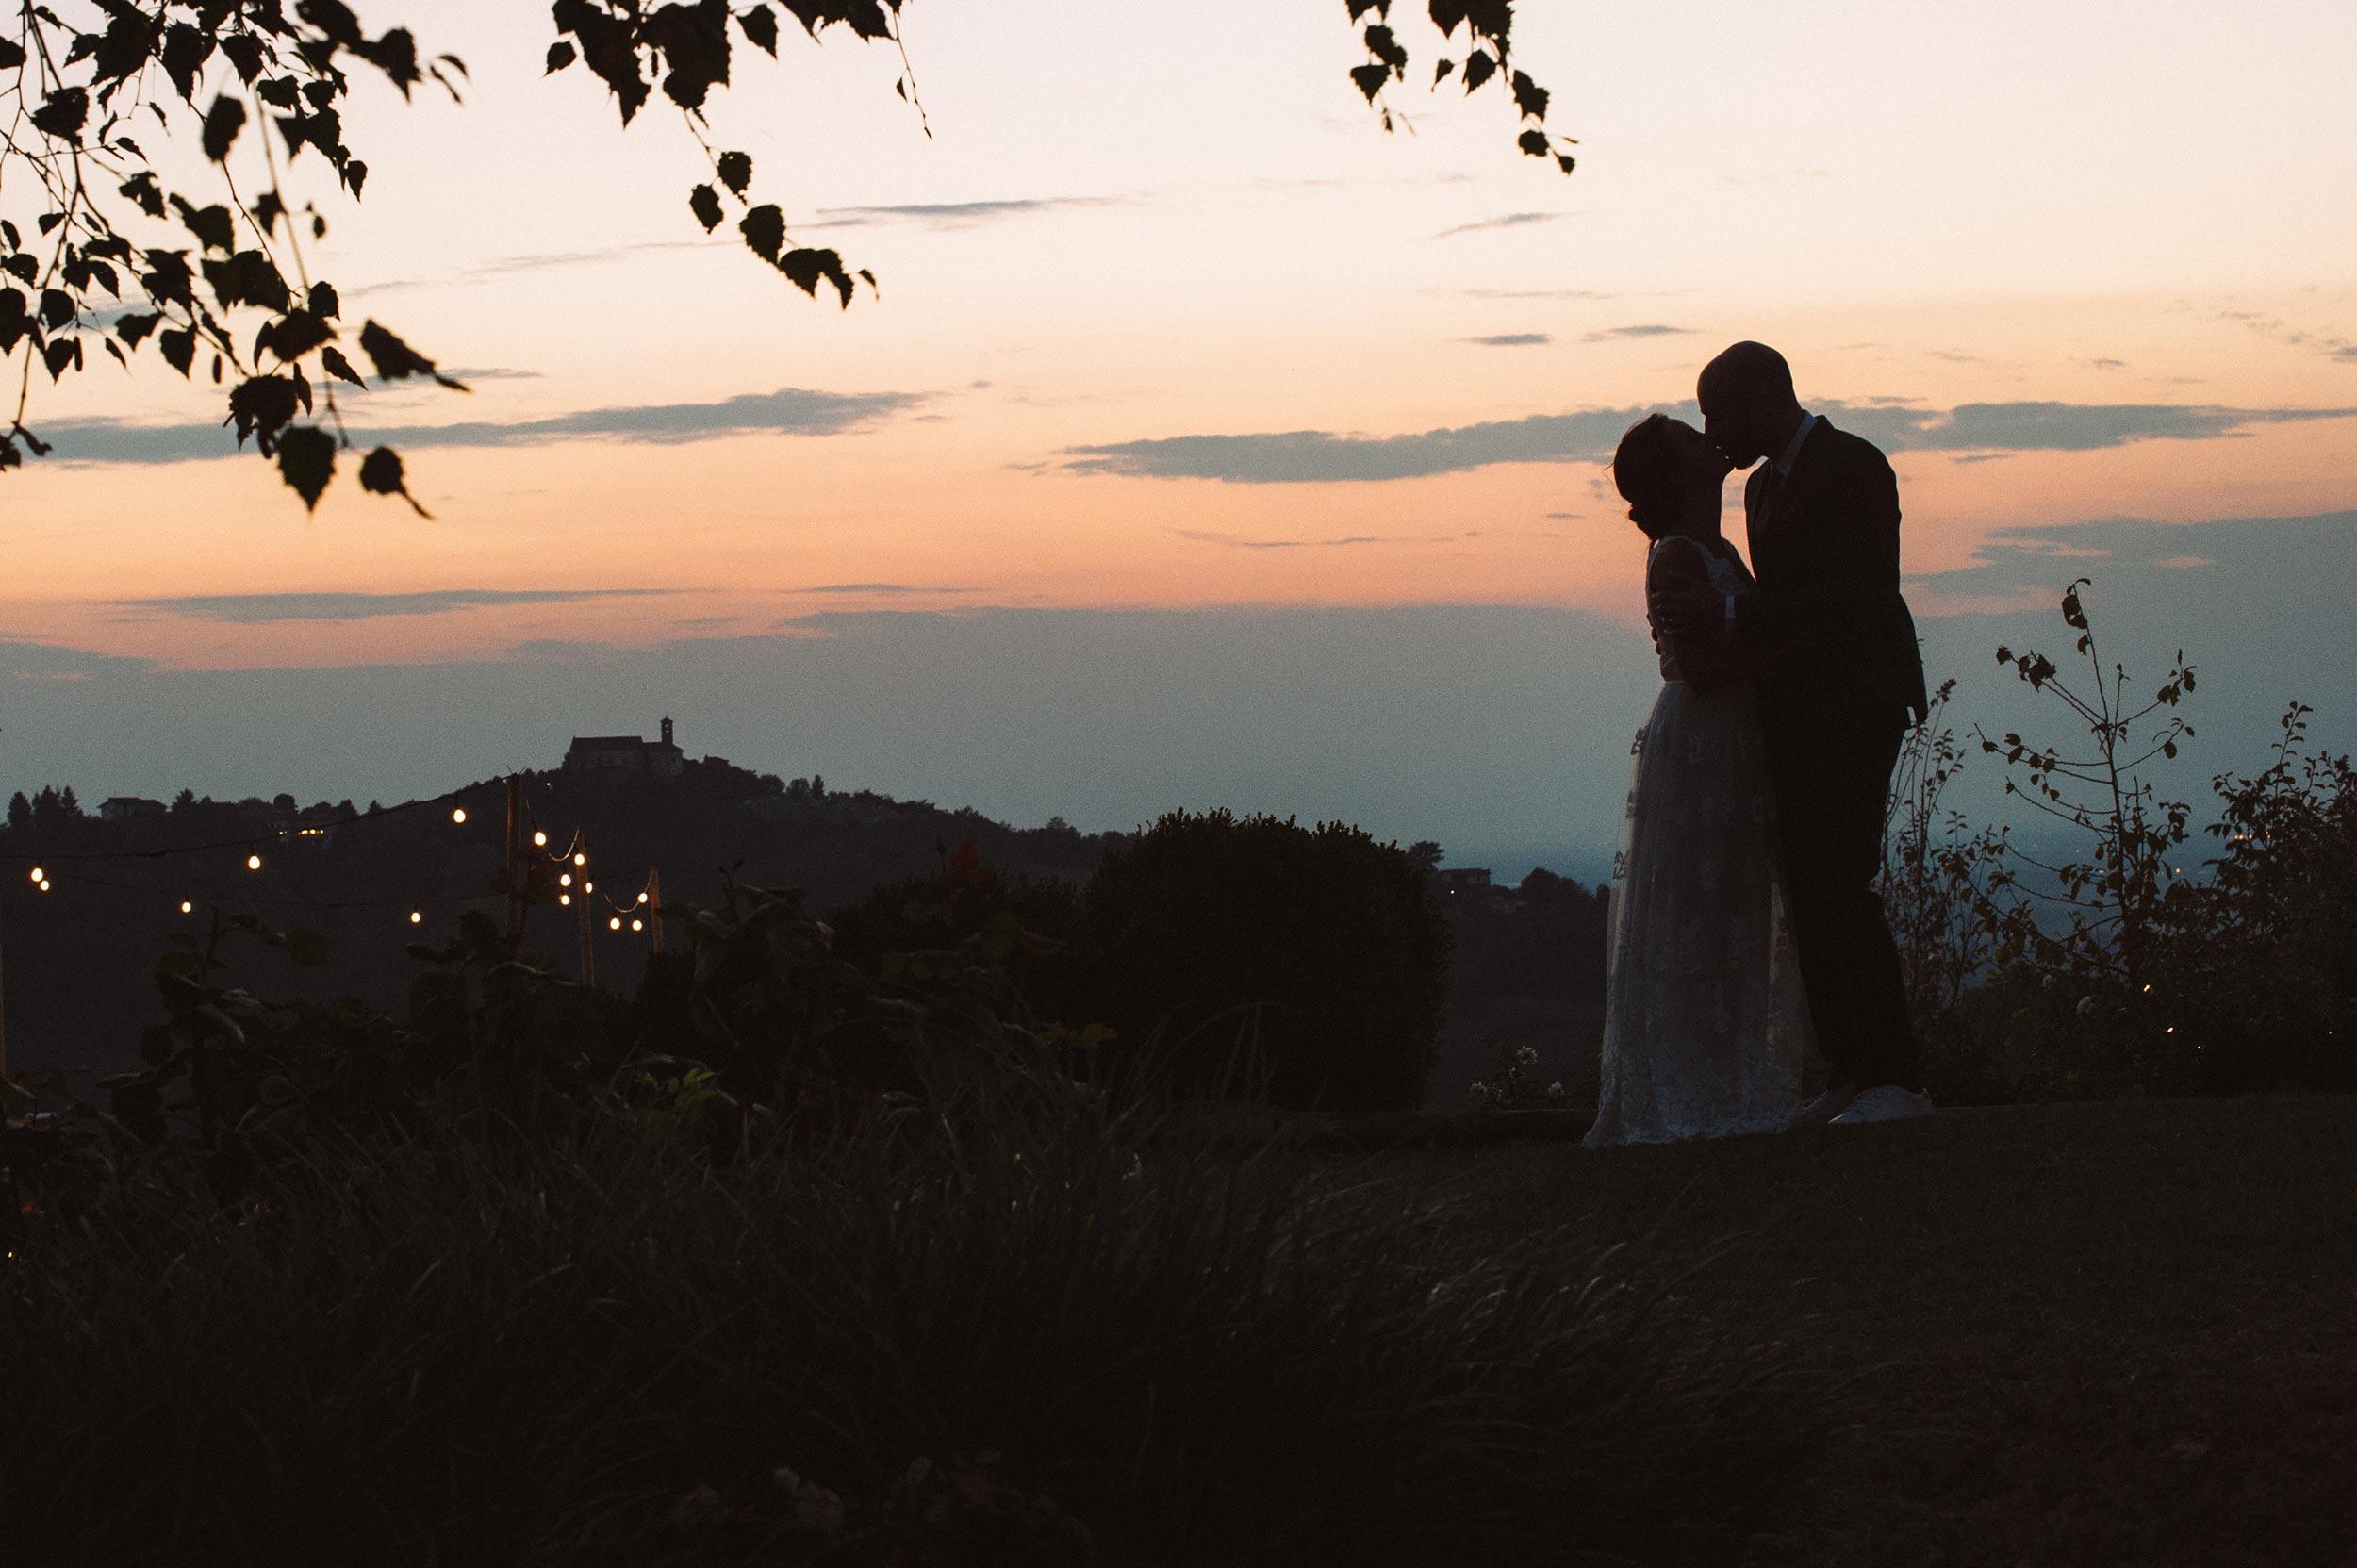 2016-Davor-Chiara-Monferrato-Asti-Vercelli-Wedding-Photographer-Italy-Alessandro-Avenali-66.jpg